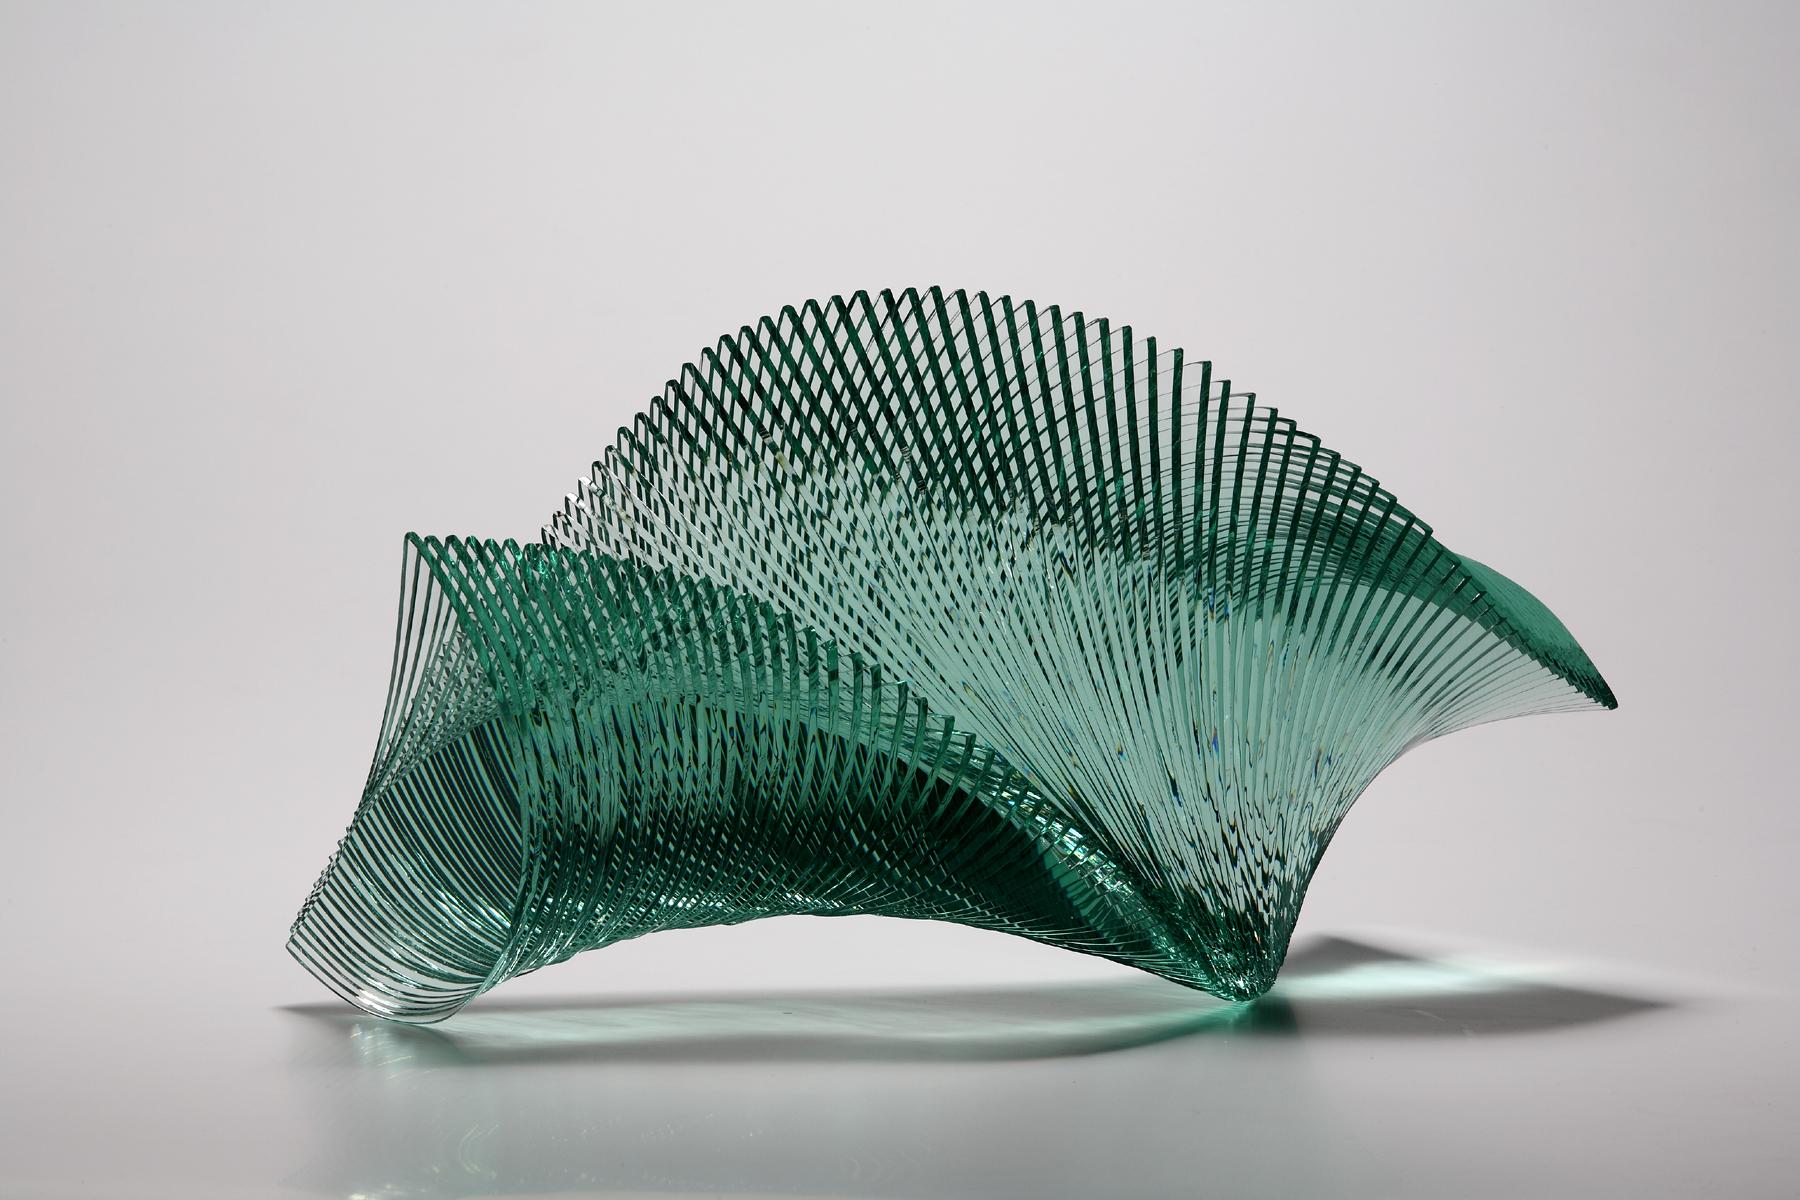 Artist Niyoko Ikuta Uses Layers Of Laminated Sheet Glass